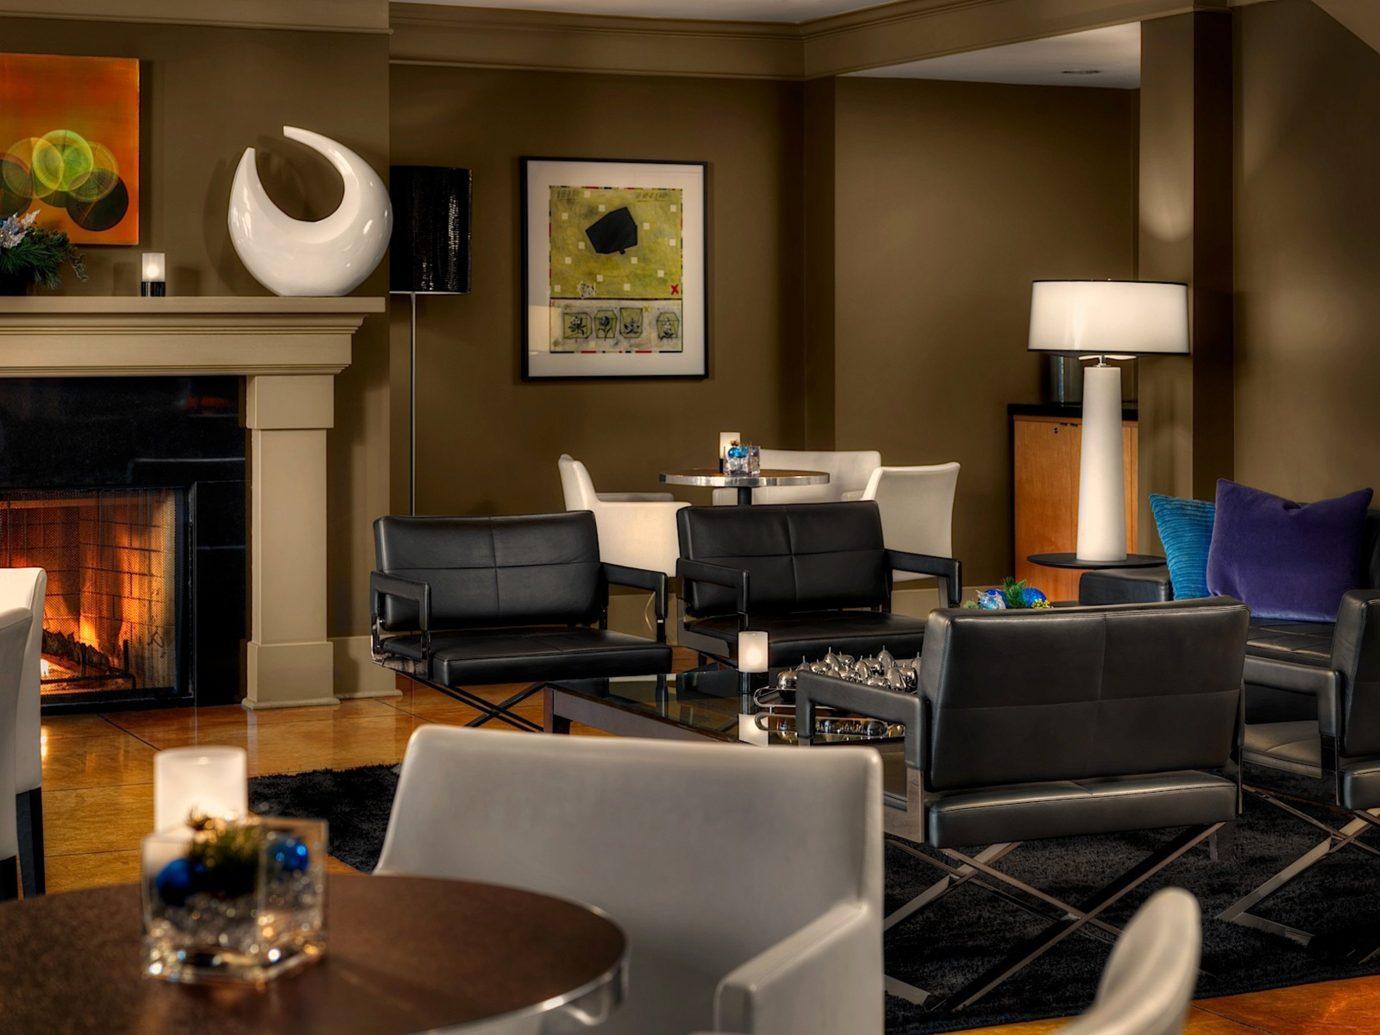 Alberta Boutique Hotels Canada Design Fireplace Hotels Inn Living Modern indoor room living room property home interior design Suite recreation room real estate estate furniture area